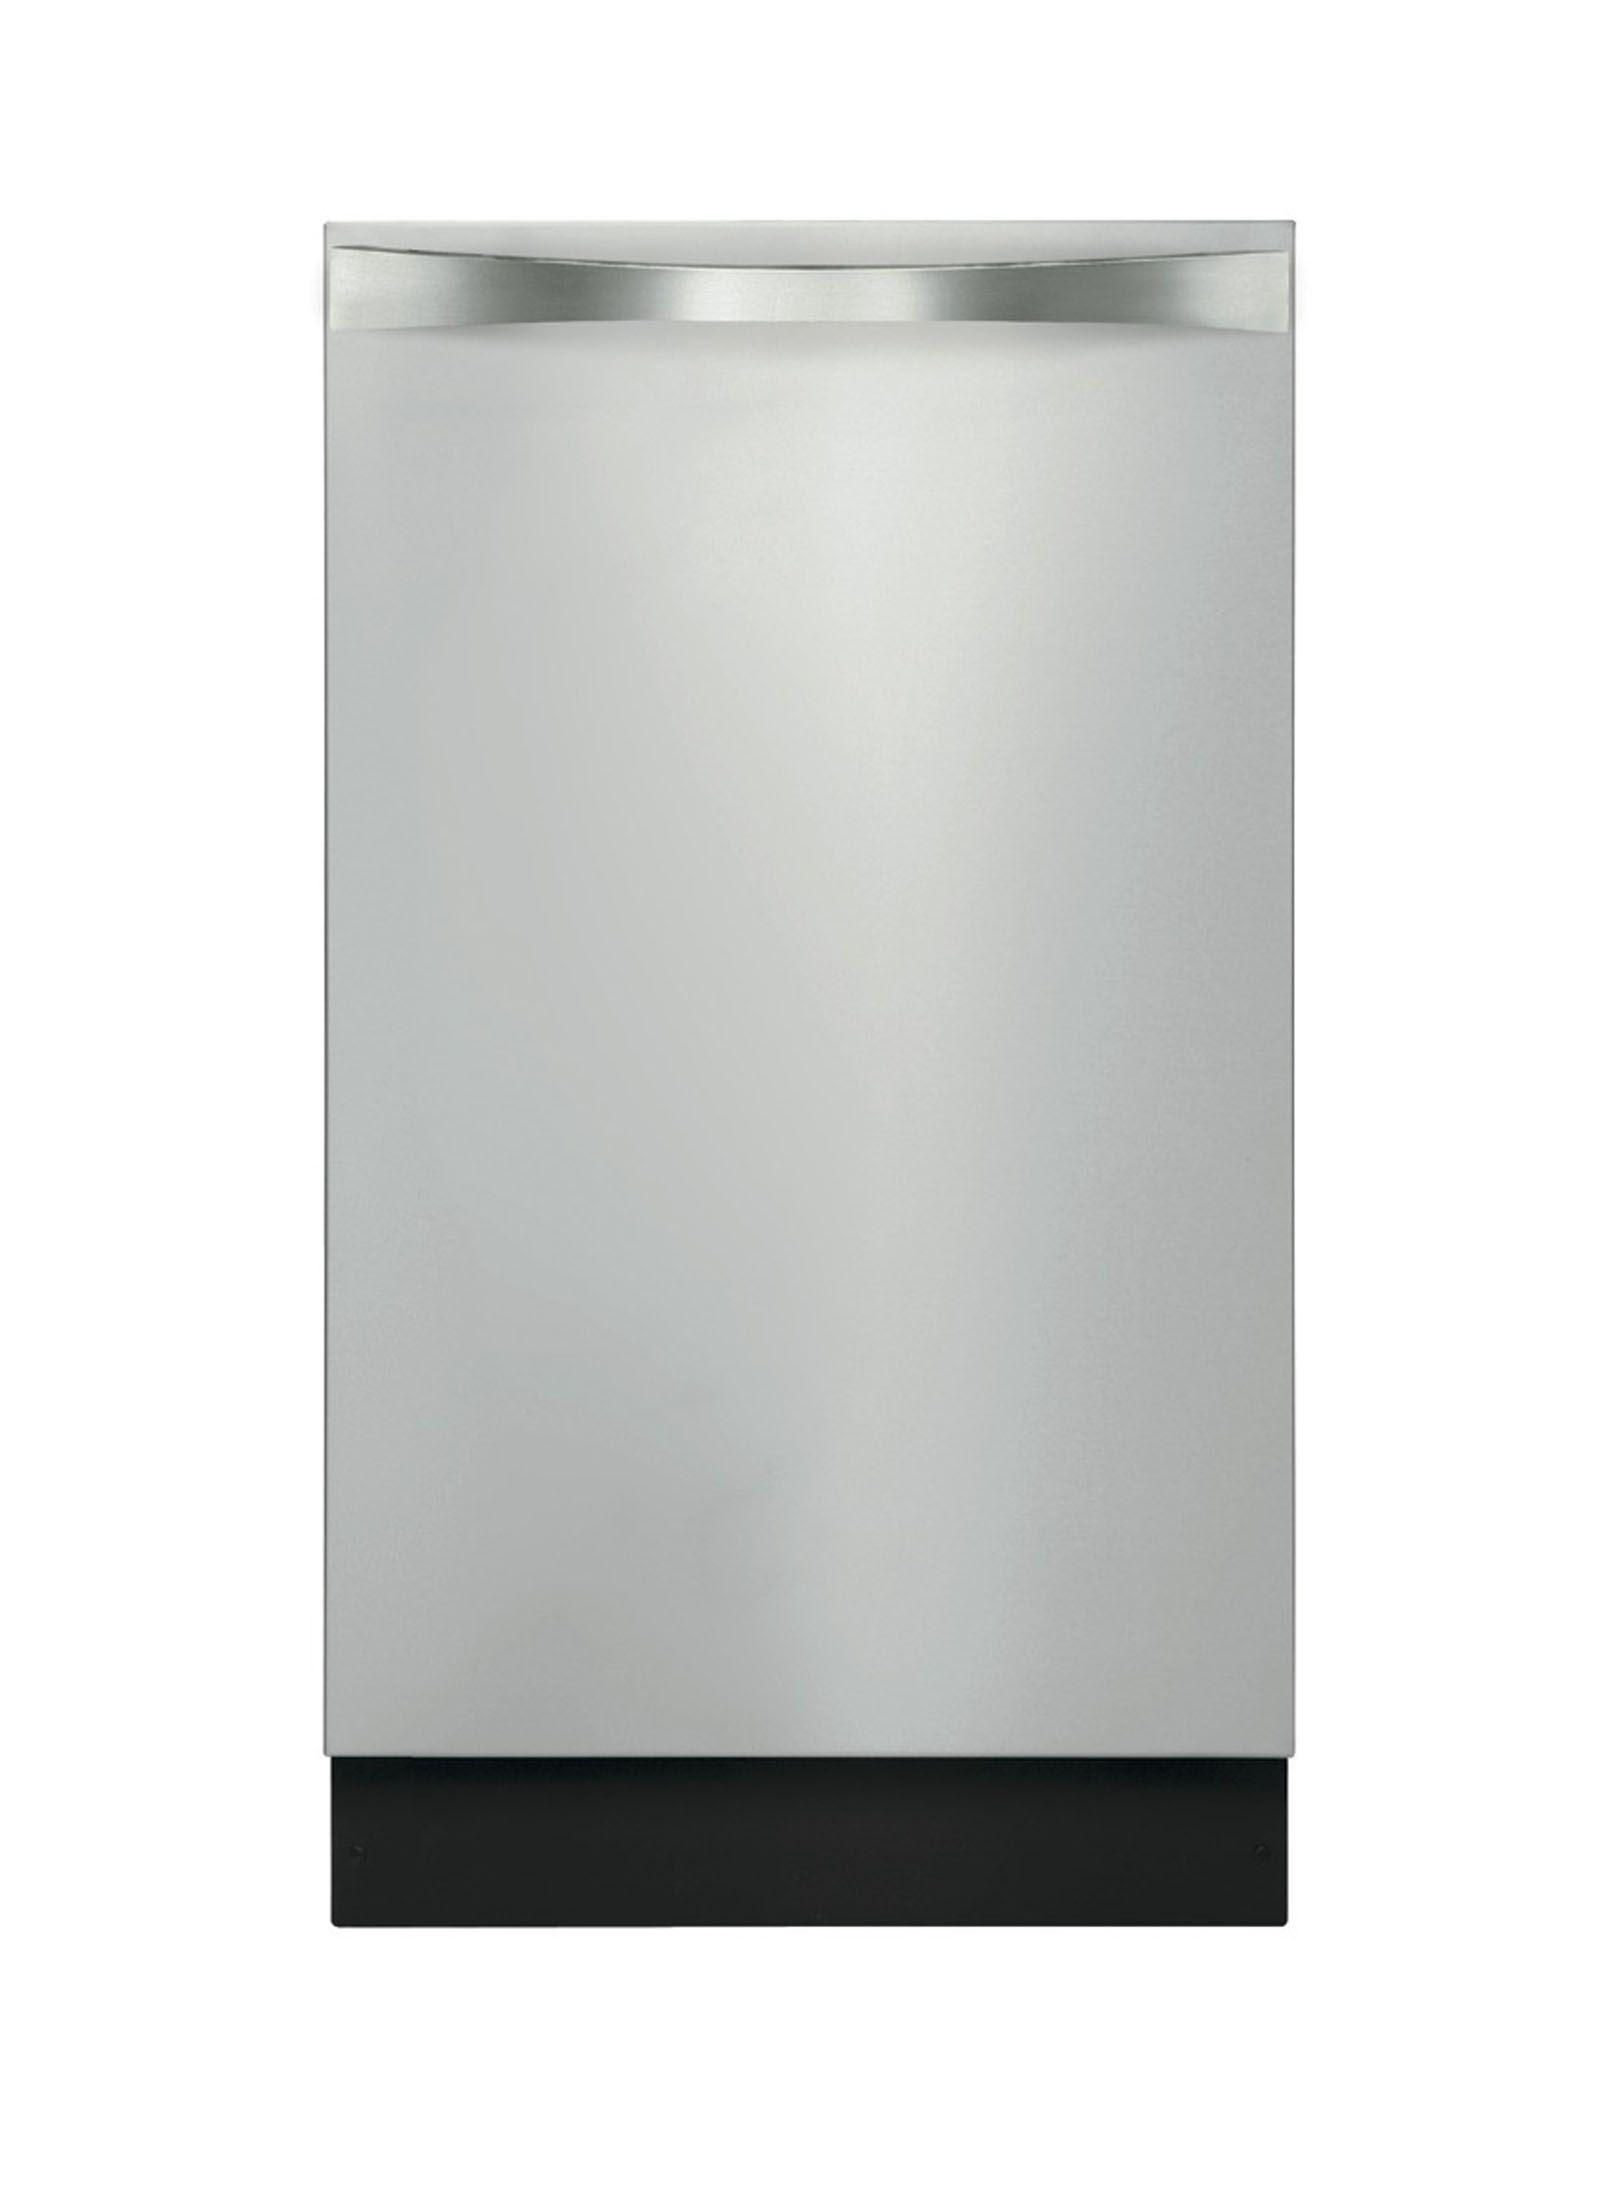 inch appliances pinterest kitchens